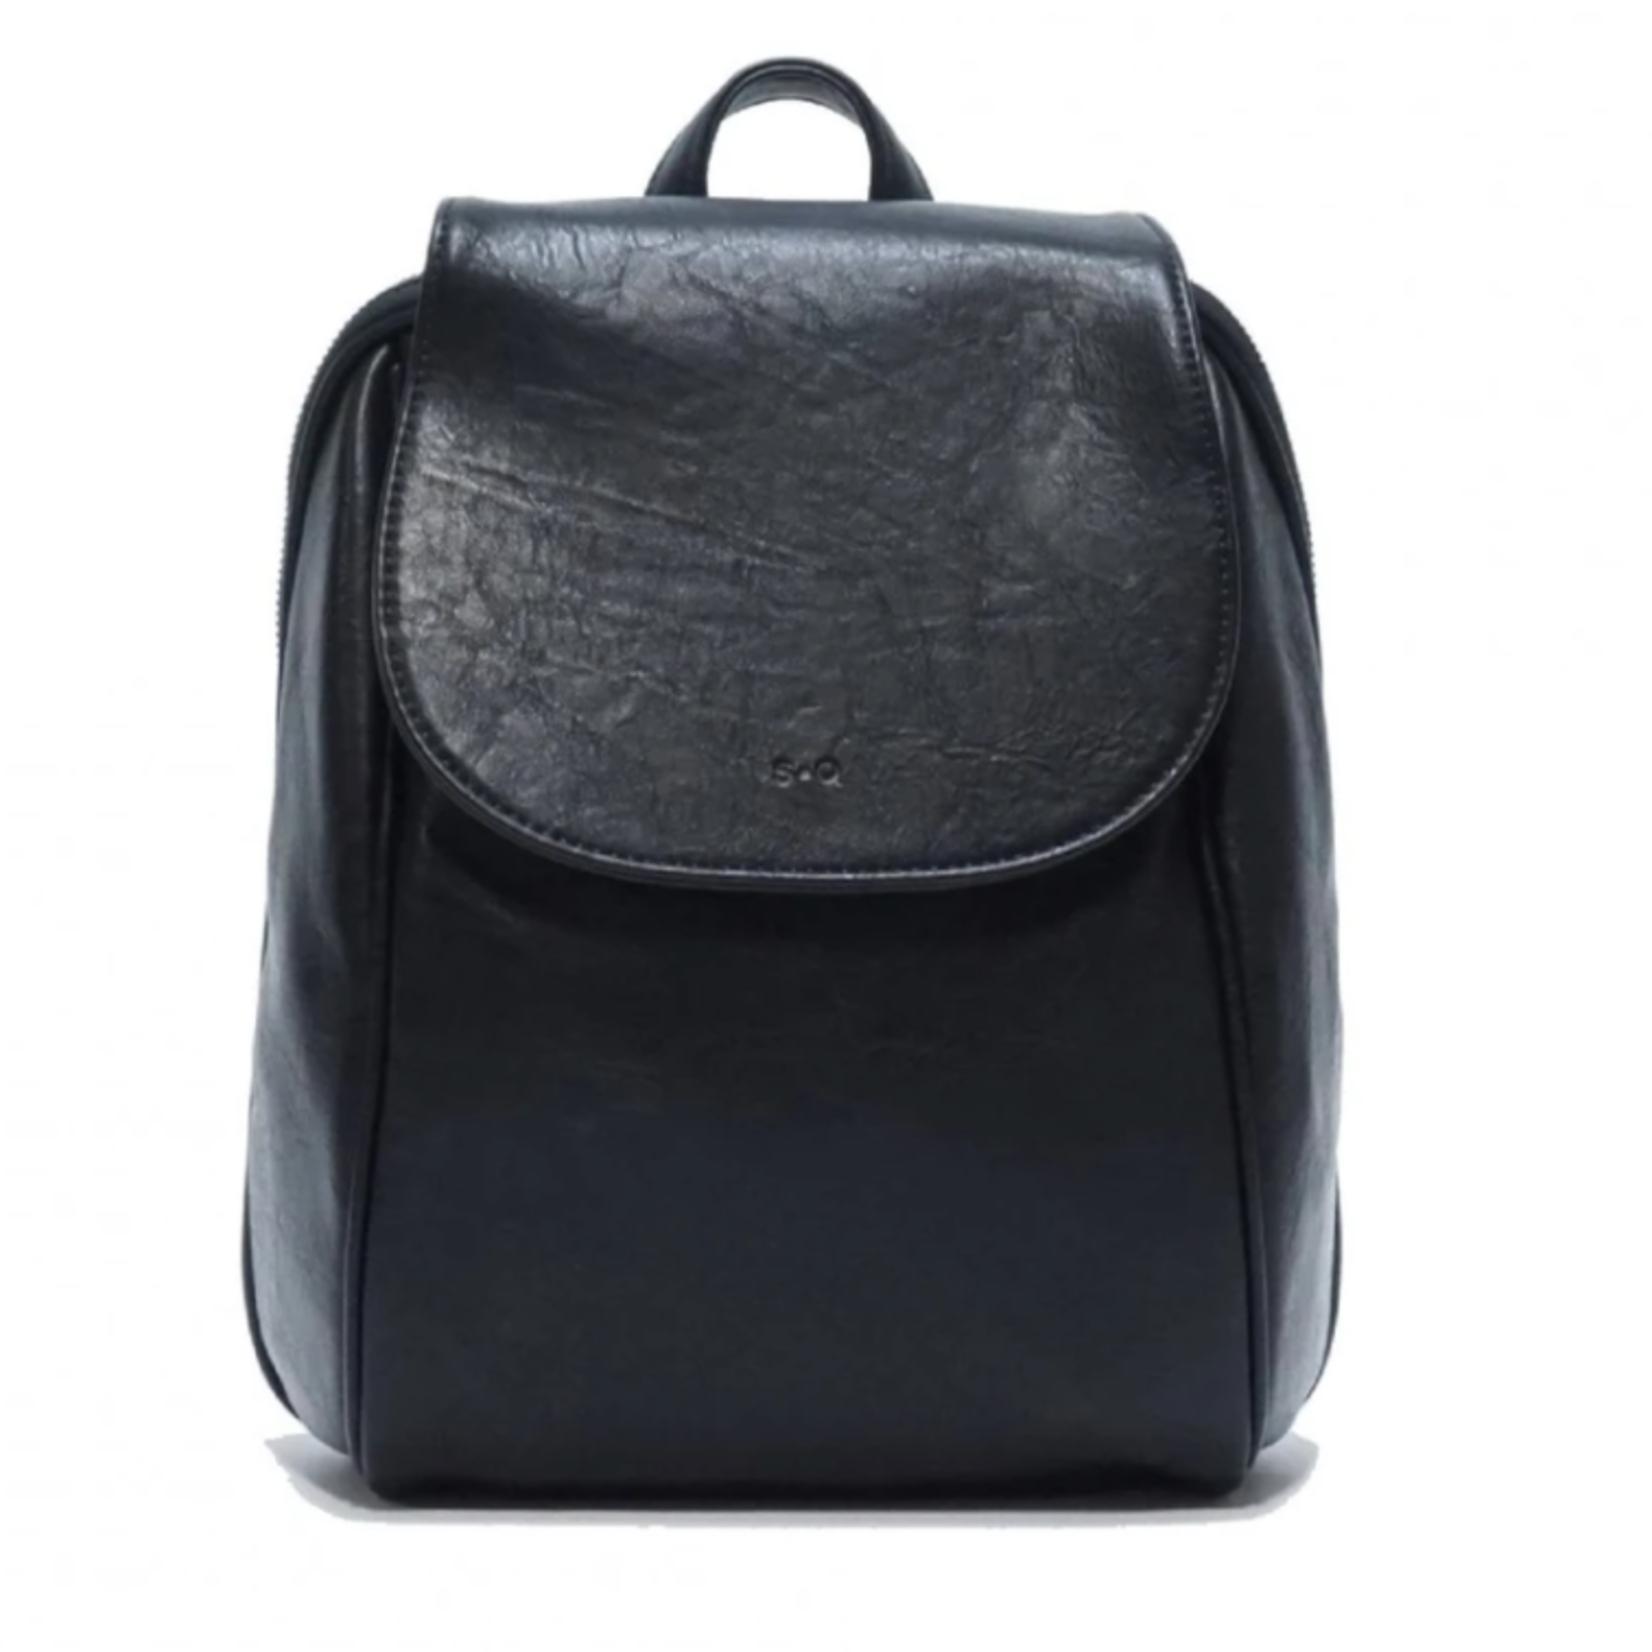 S-Q Inc. Jada Convertible Backpack